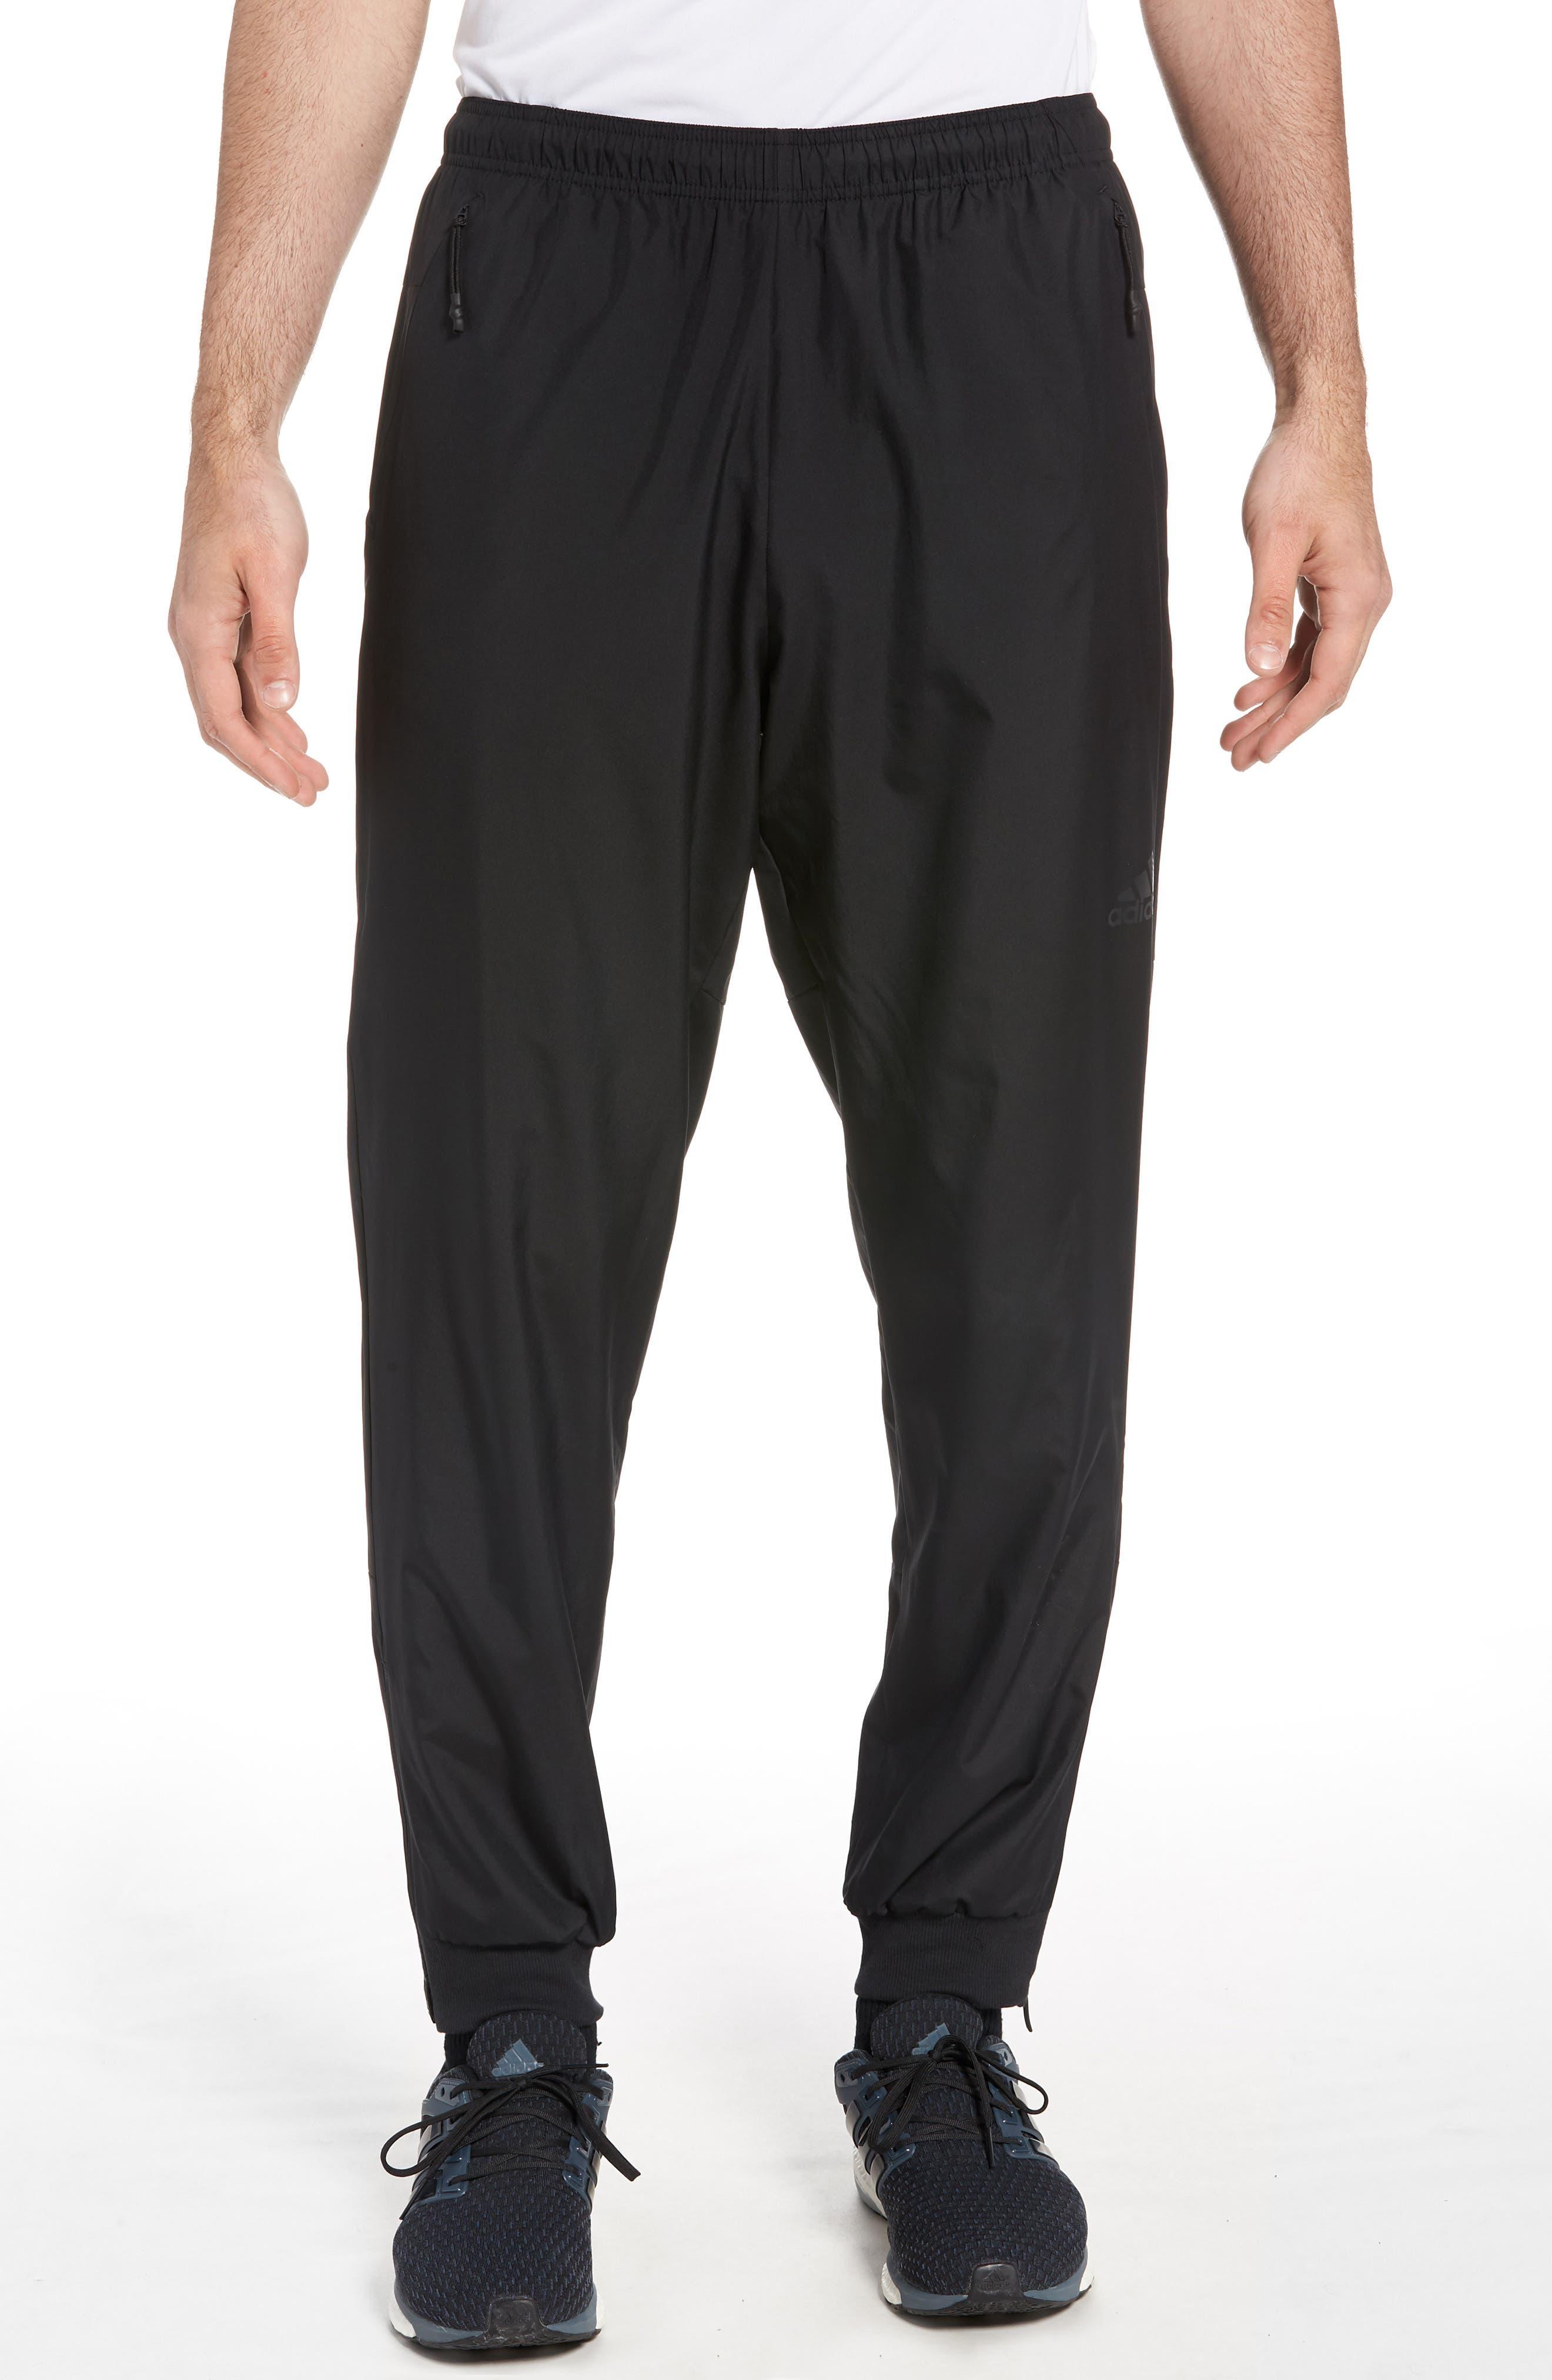 Slim Fit Sweatpants,                         Main,                         color, Black